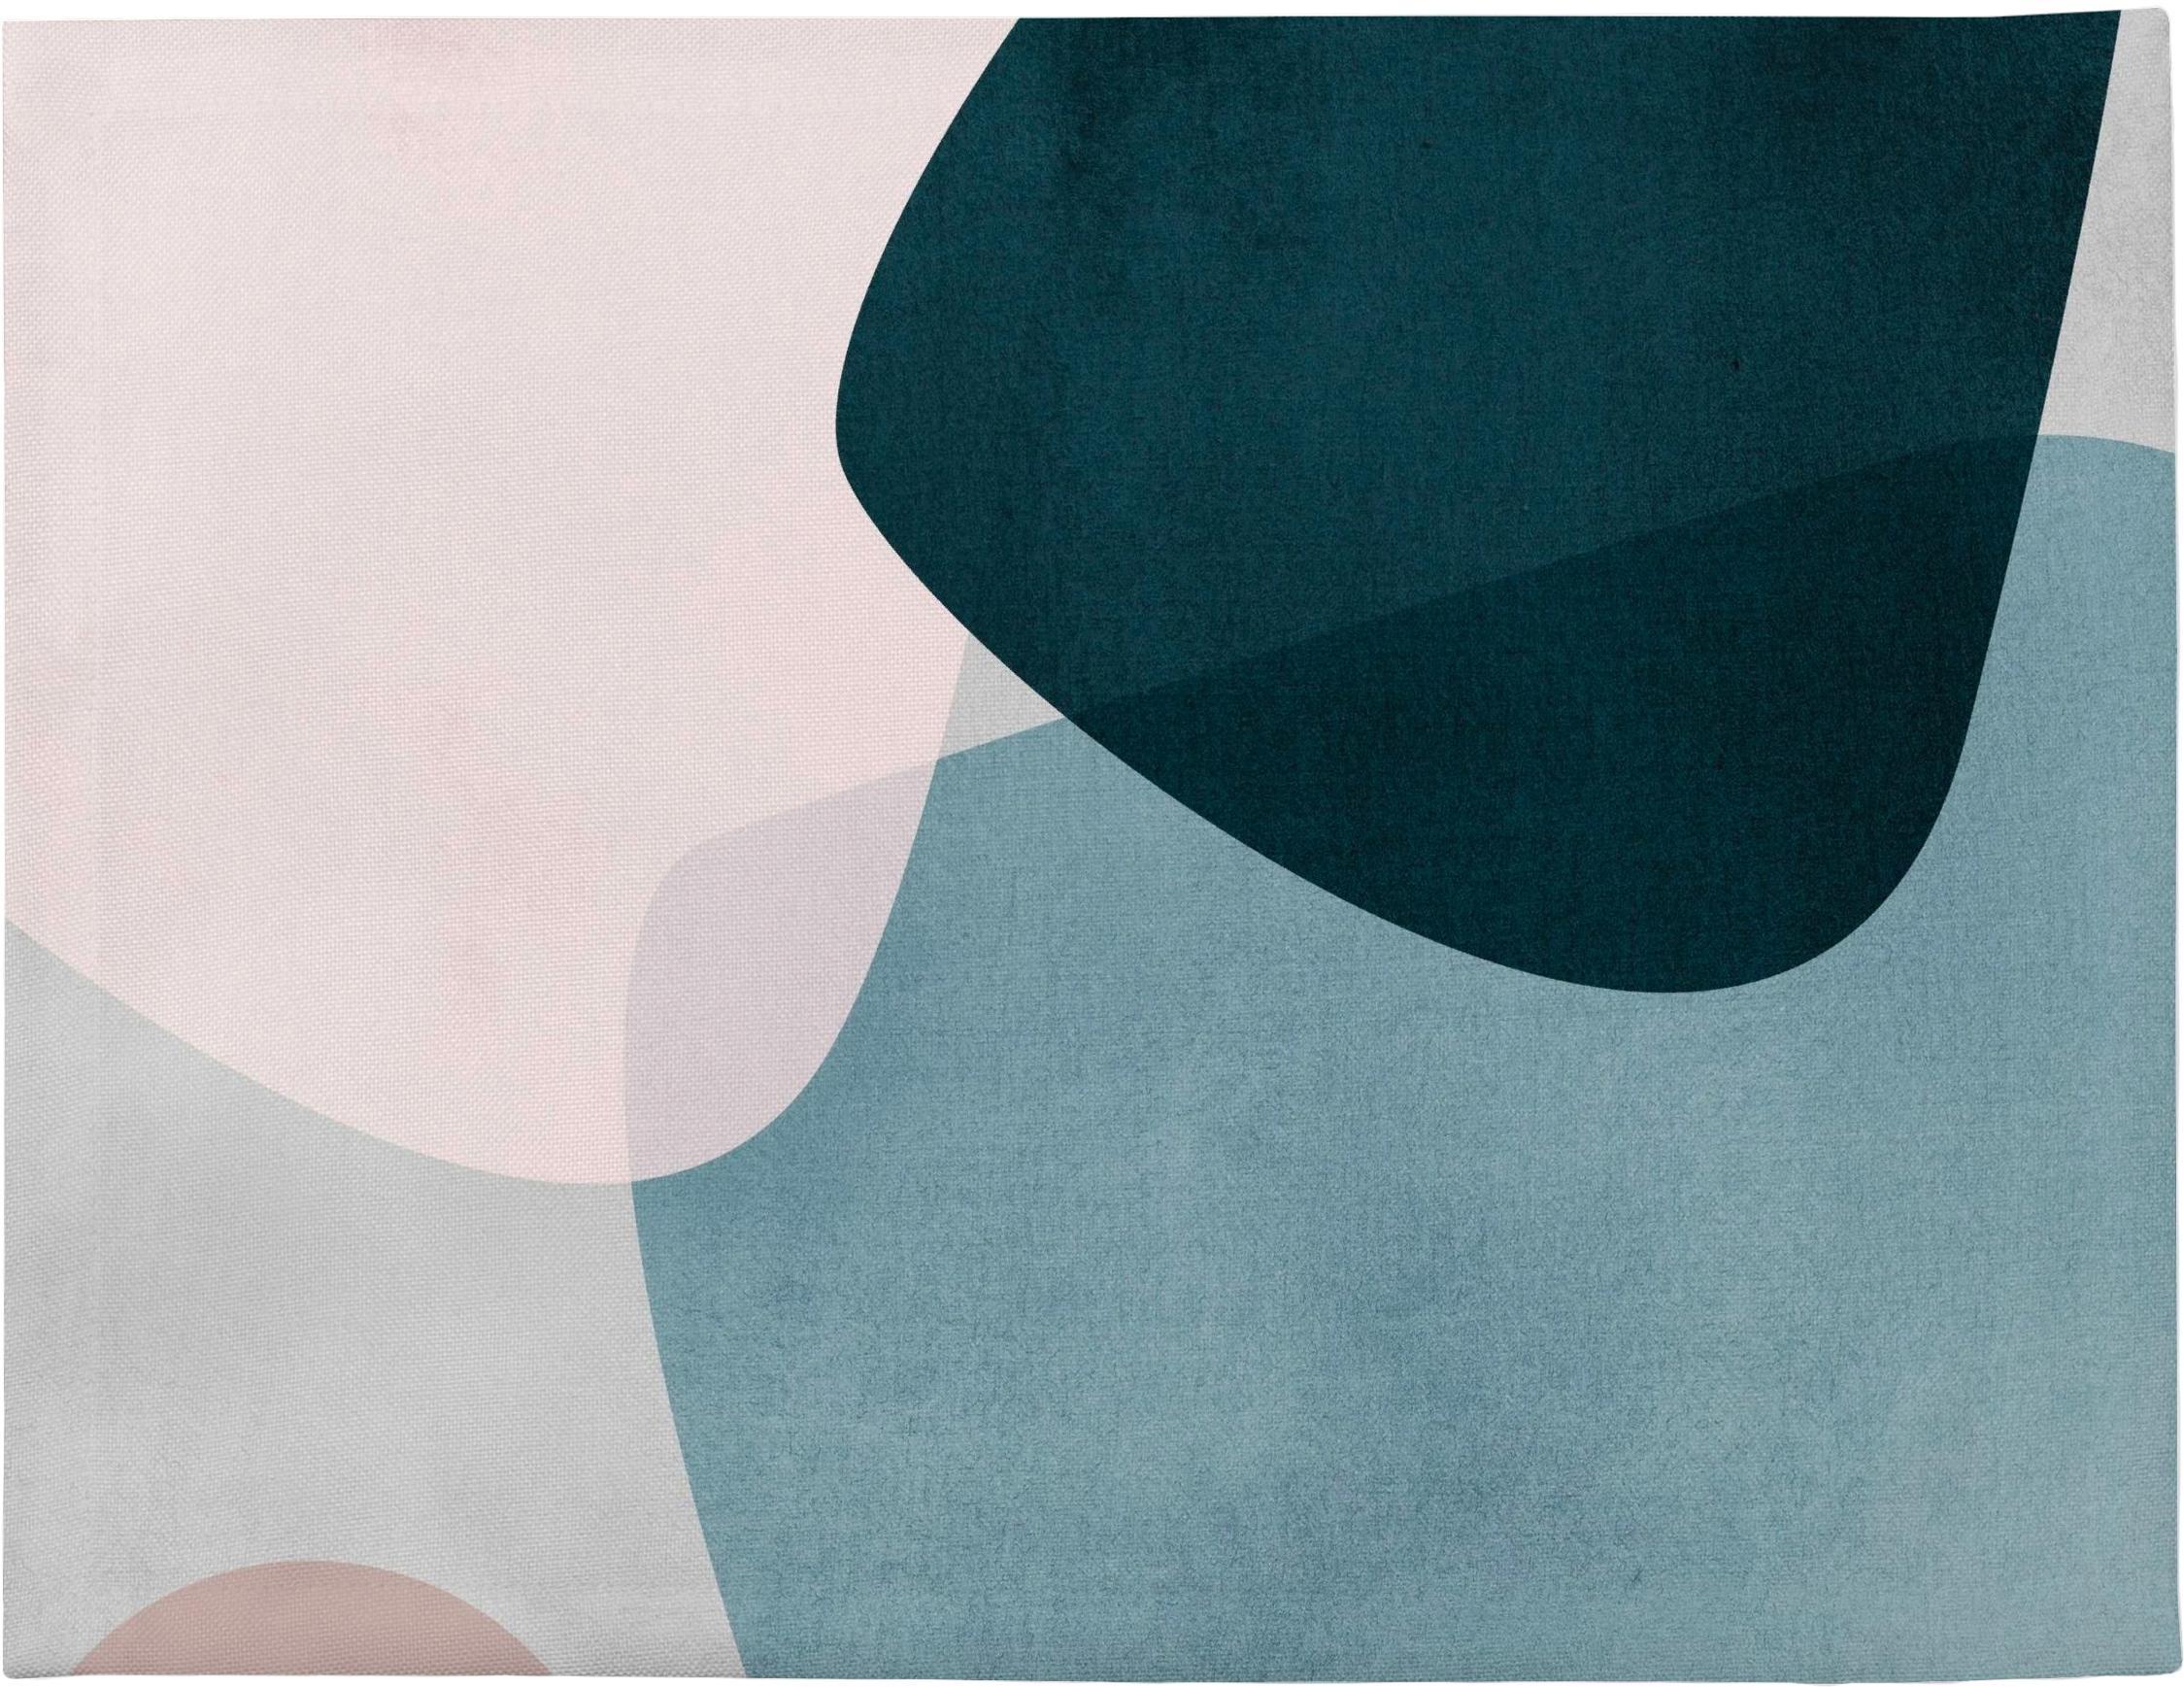 Placemats Graphic, 4 stuks, Polyester, Donkerblauw, blauw, grijs, roze, 35 x 45 cm